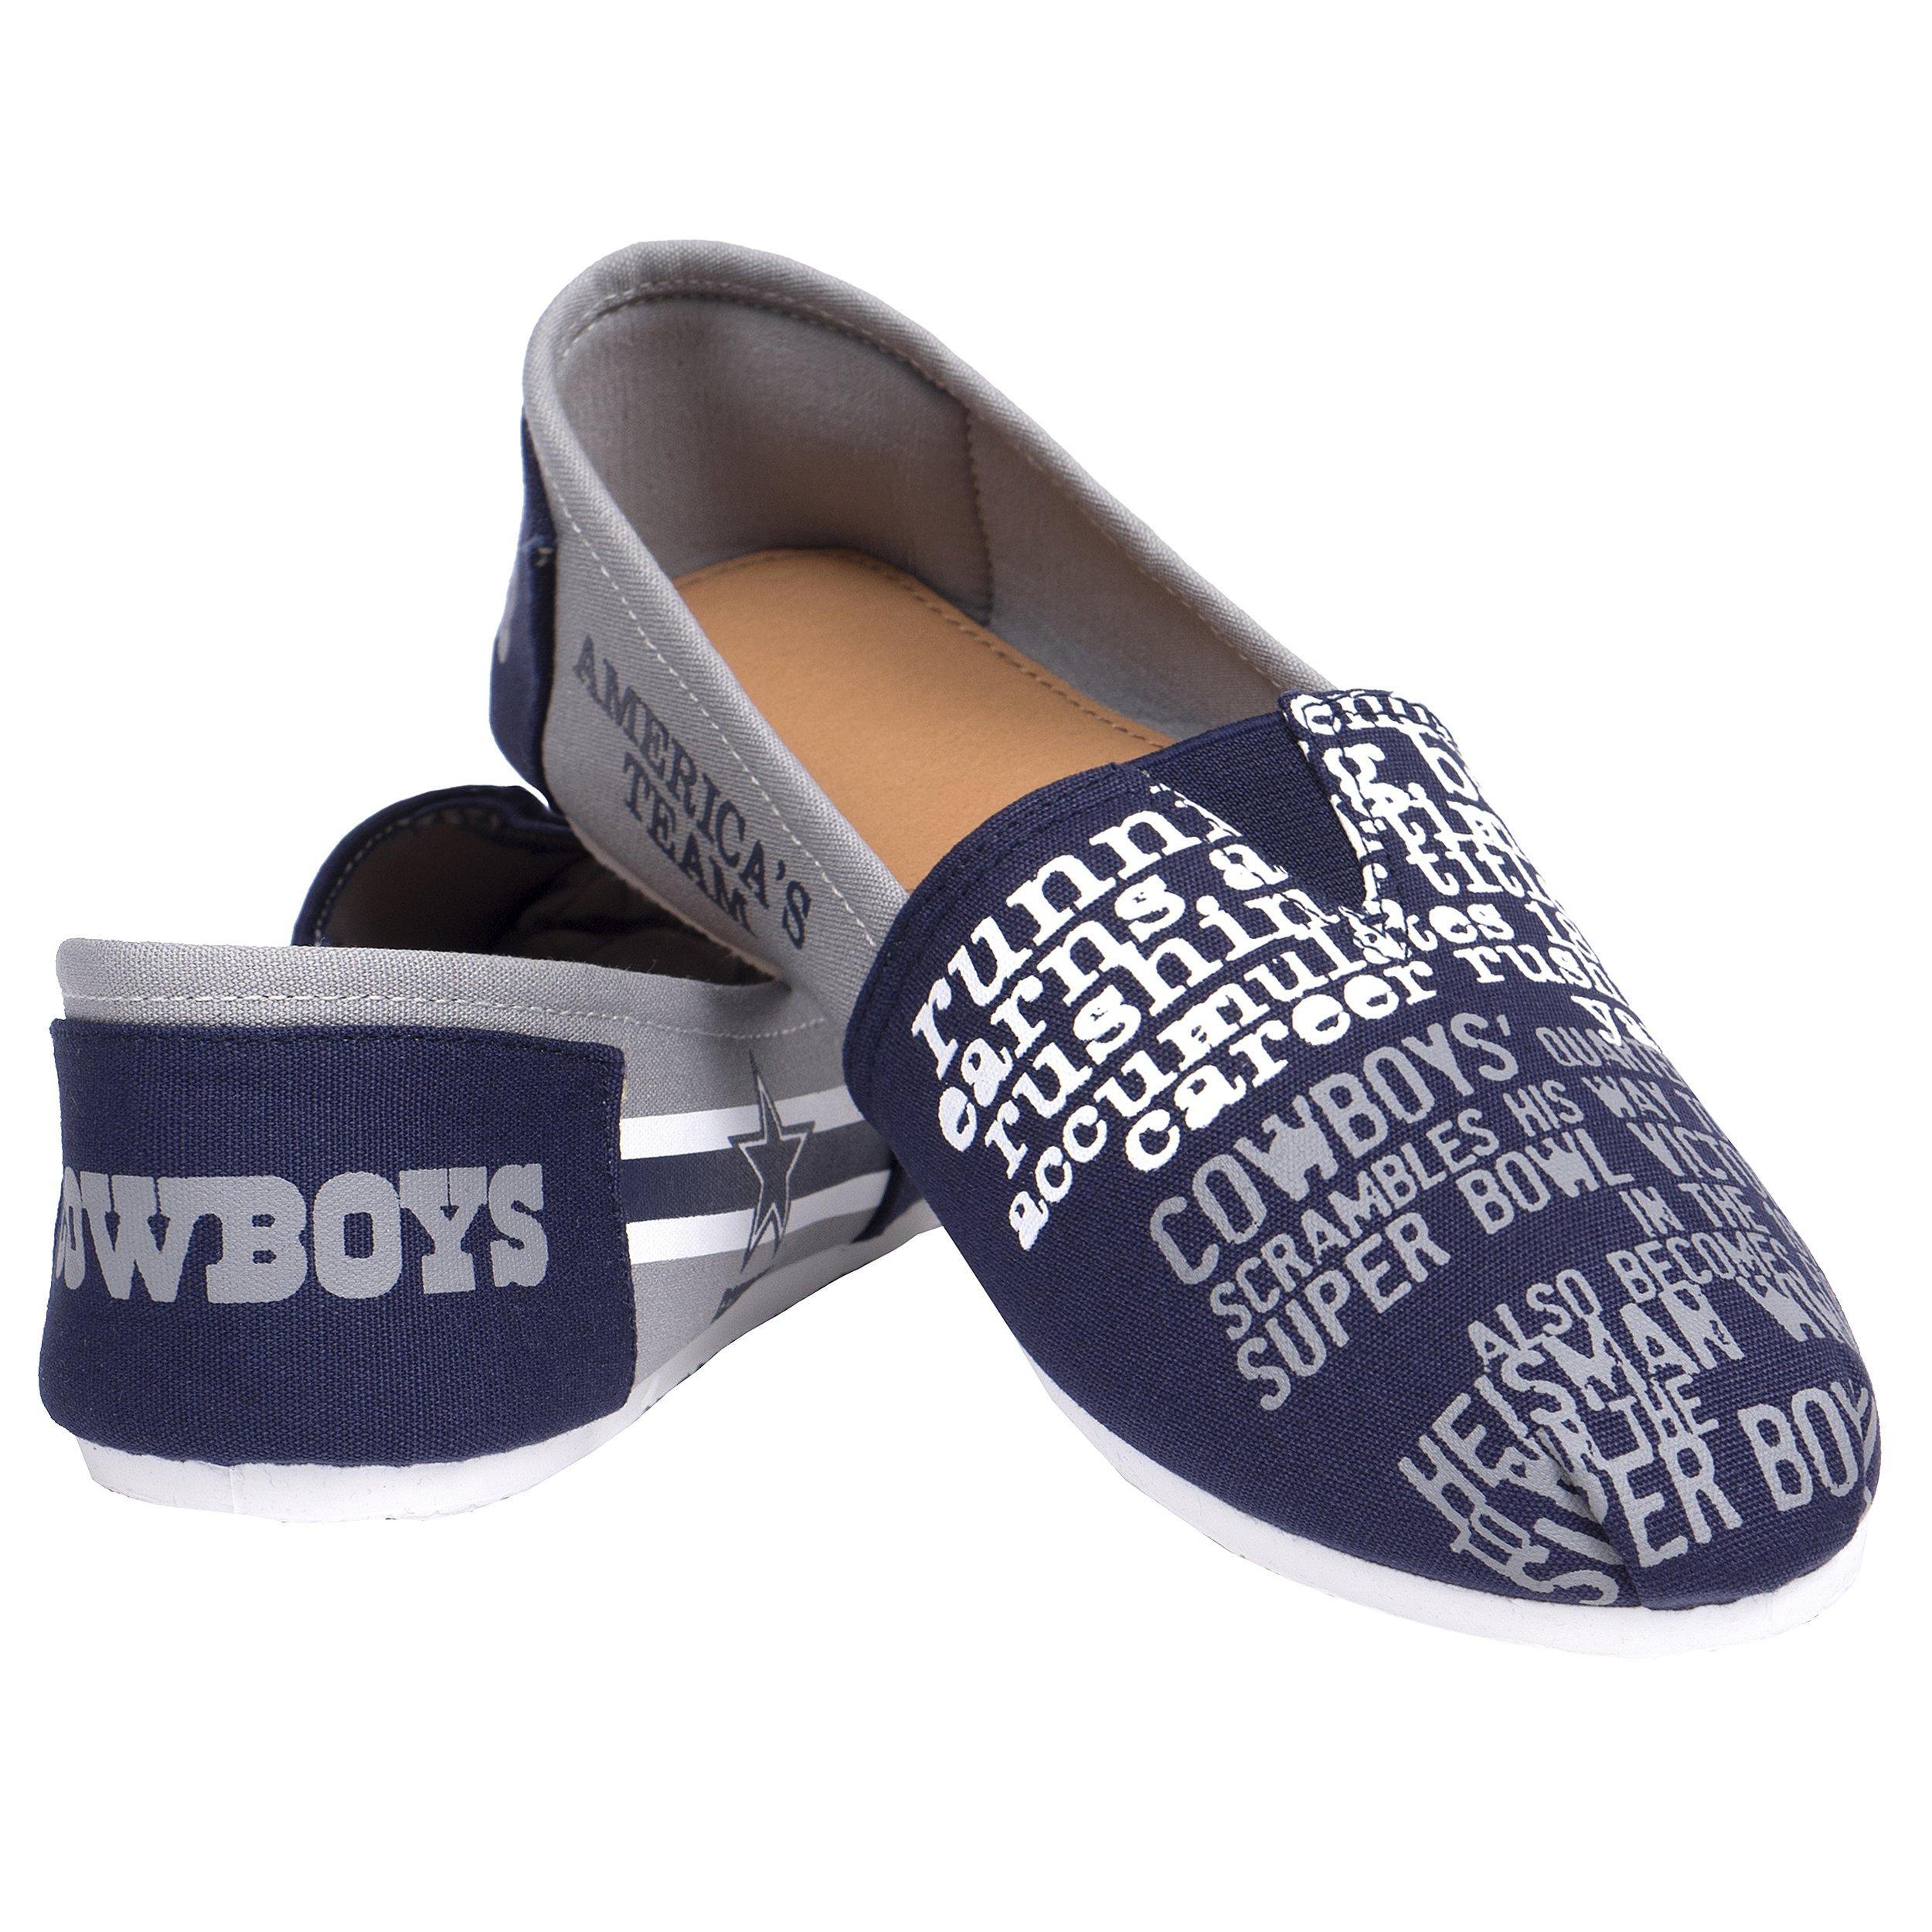 FOCO NFL Womens SMU Thematic Womens Canvas Shoe: Dallas Cowboys, Medium